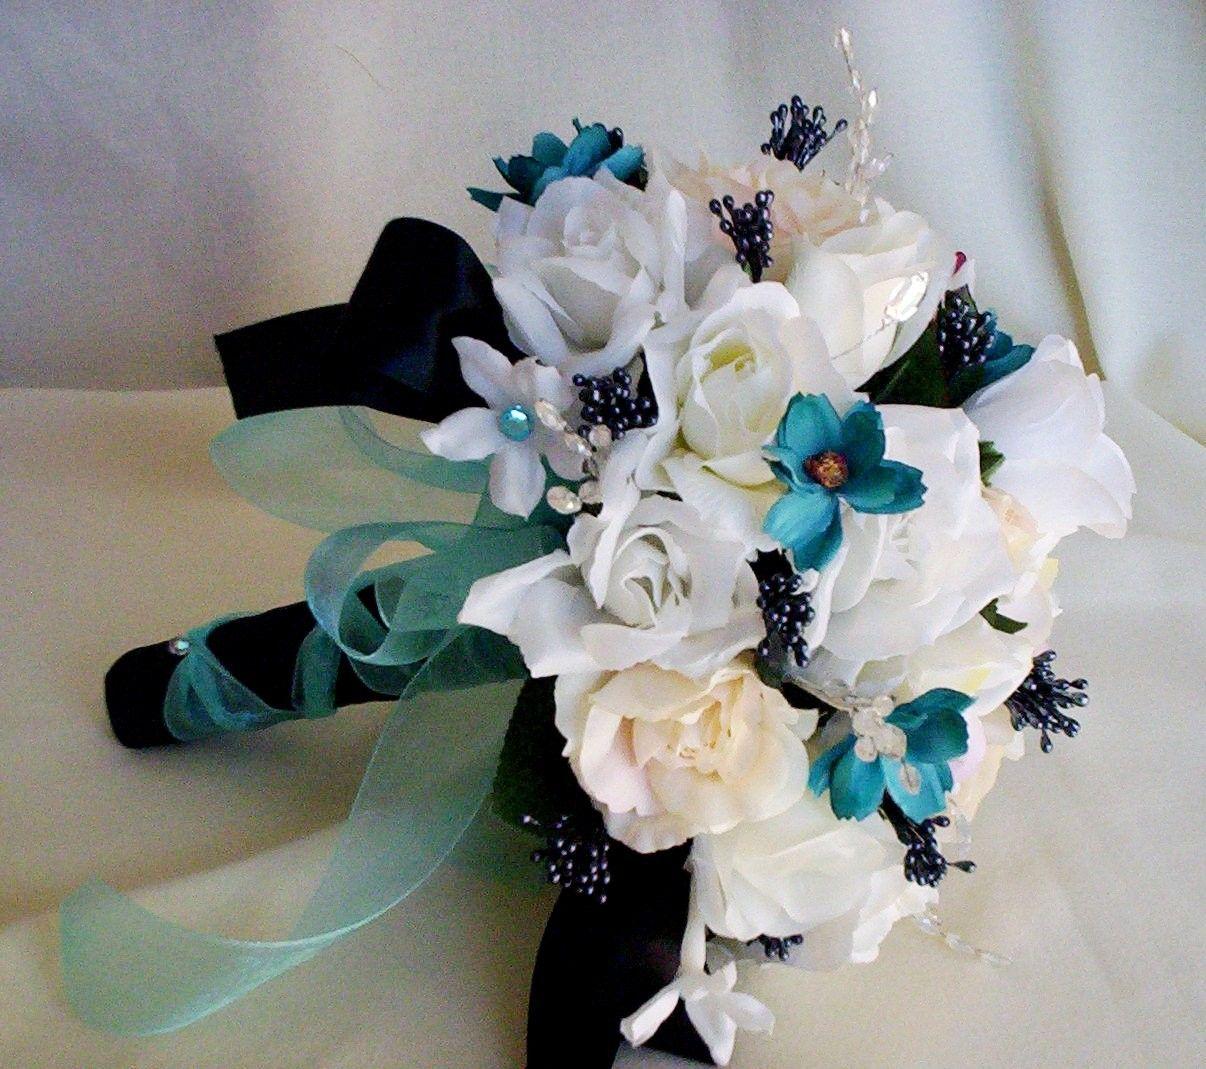 Wedding accessories turquoise wedding flowers package bridal bouquet turquoise wedding flowers bridal bouquet black aqua tiffany blue 9800 via etsy mightylinksfo